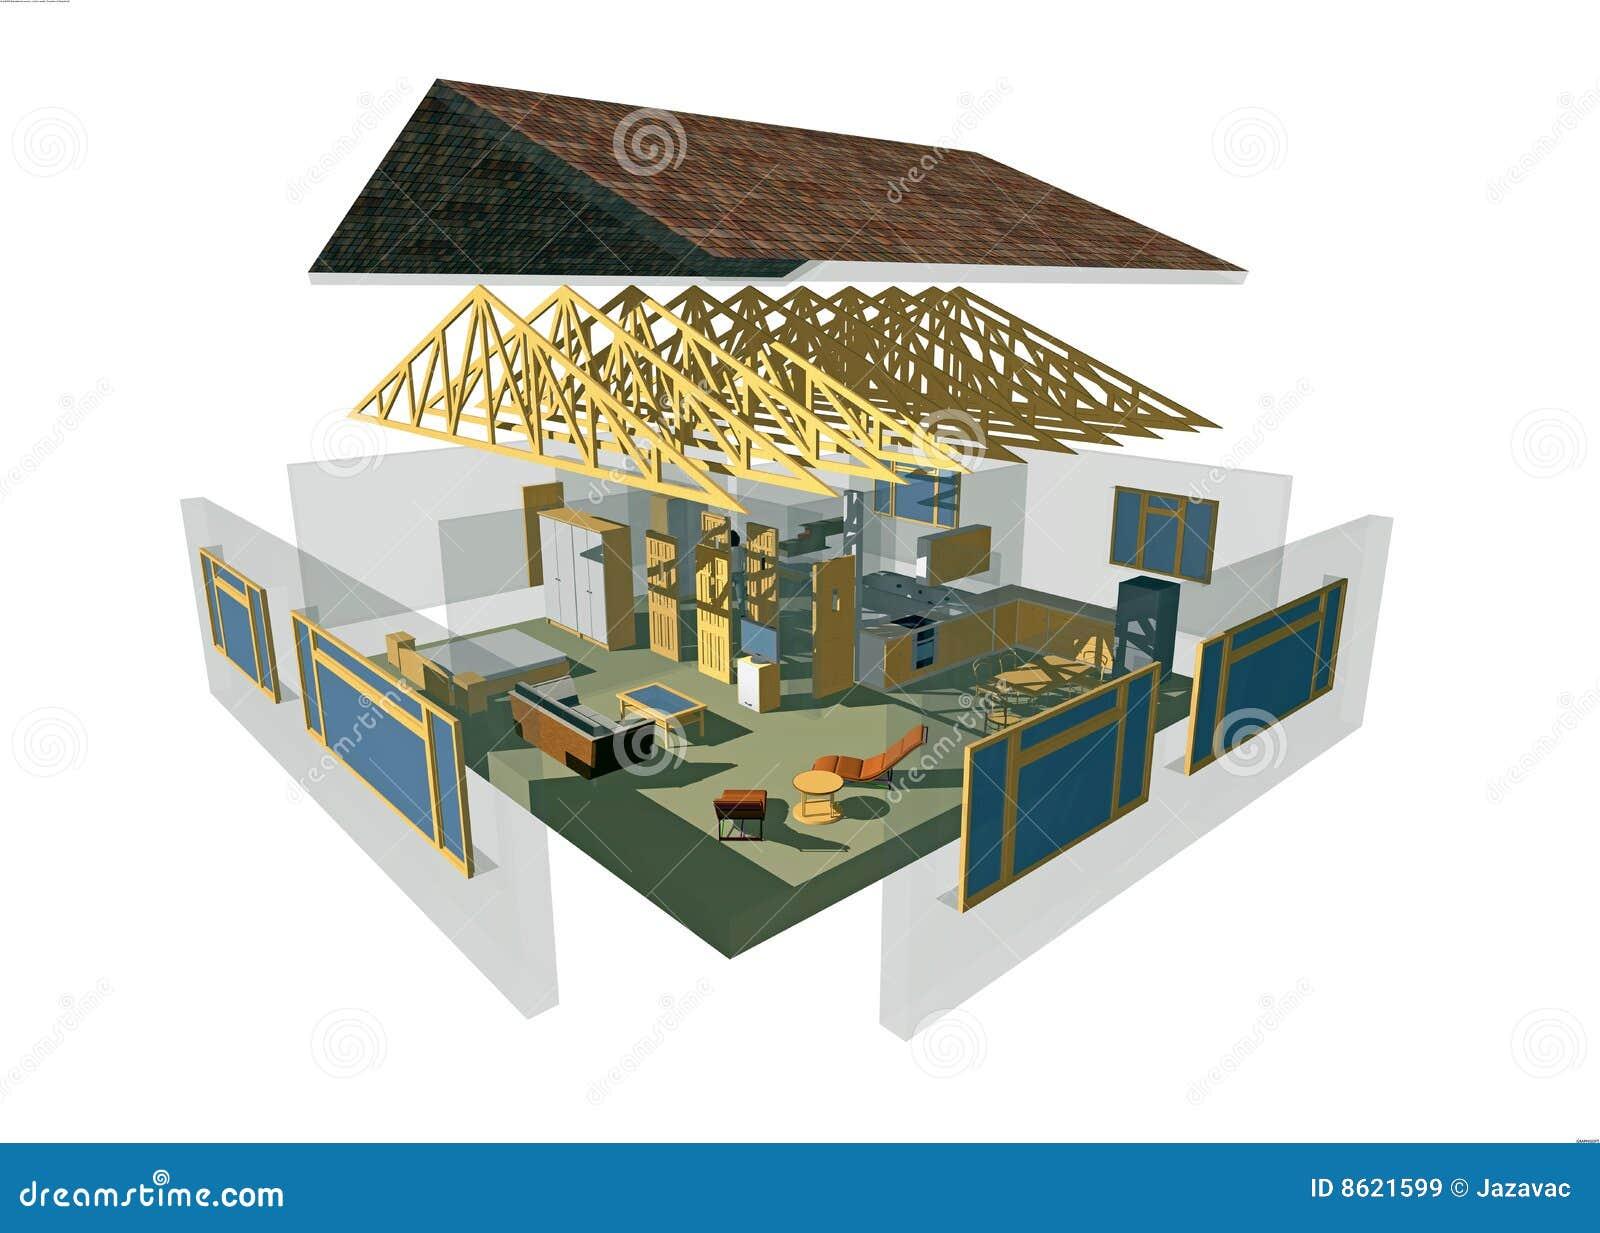 3d house royalty free stock images image 8621599 for Simulateur maison 3d